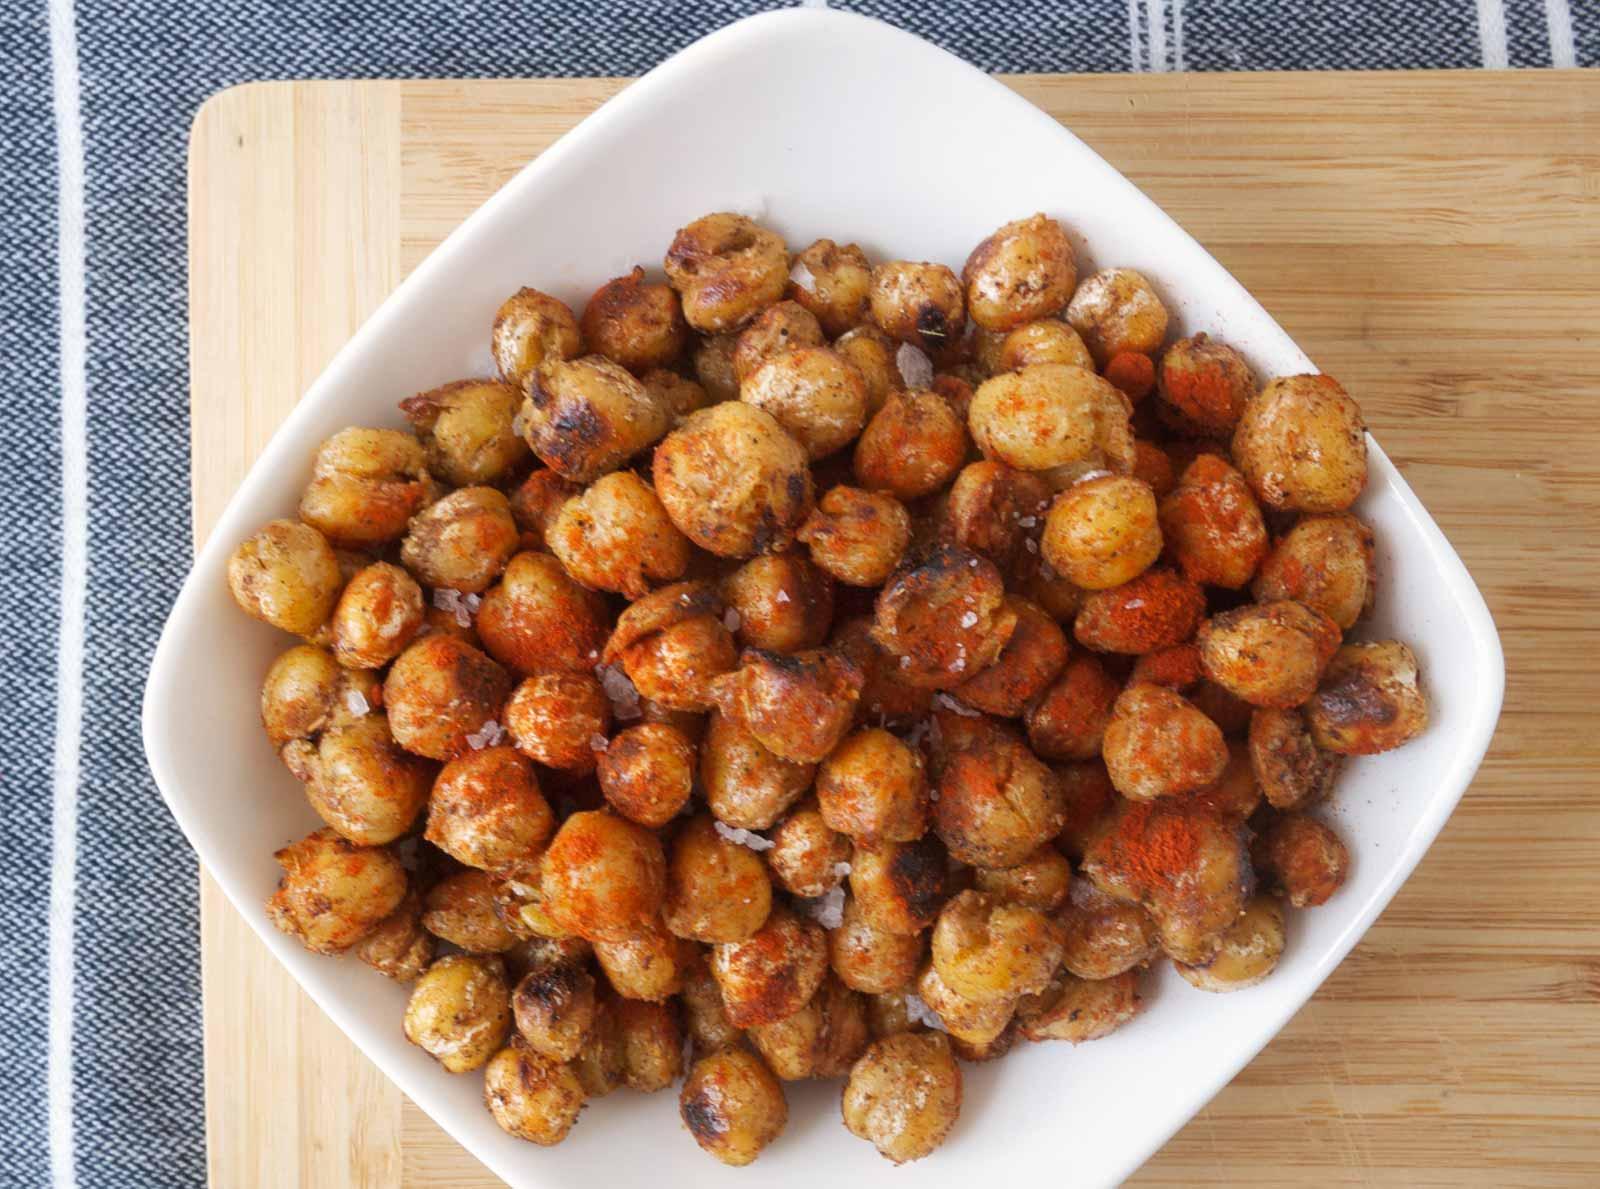 Spiced Popcorn Chickpeas